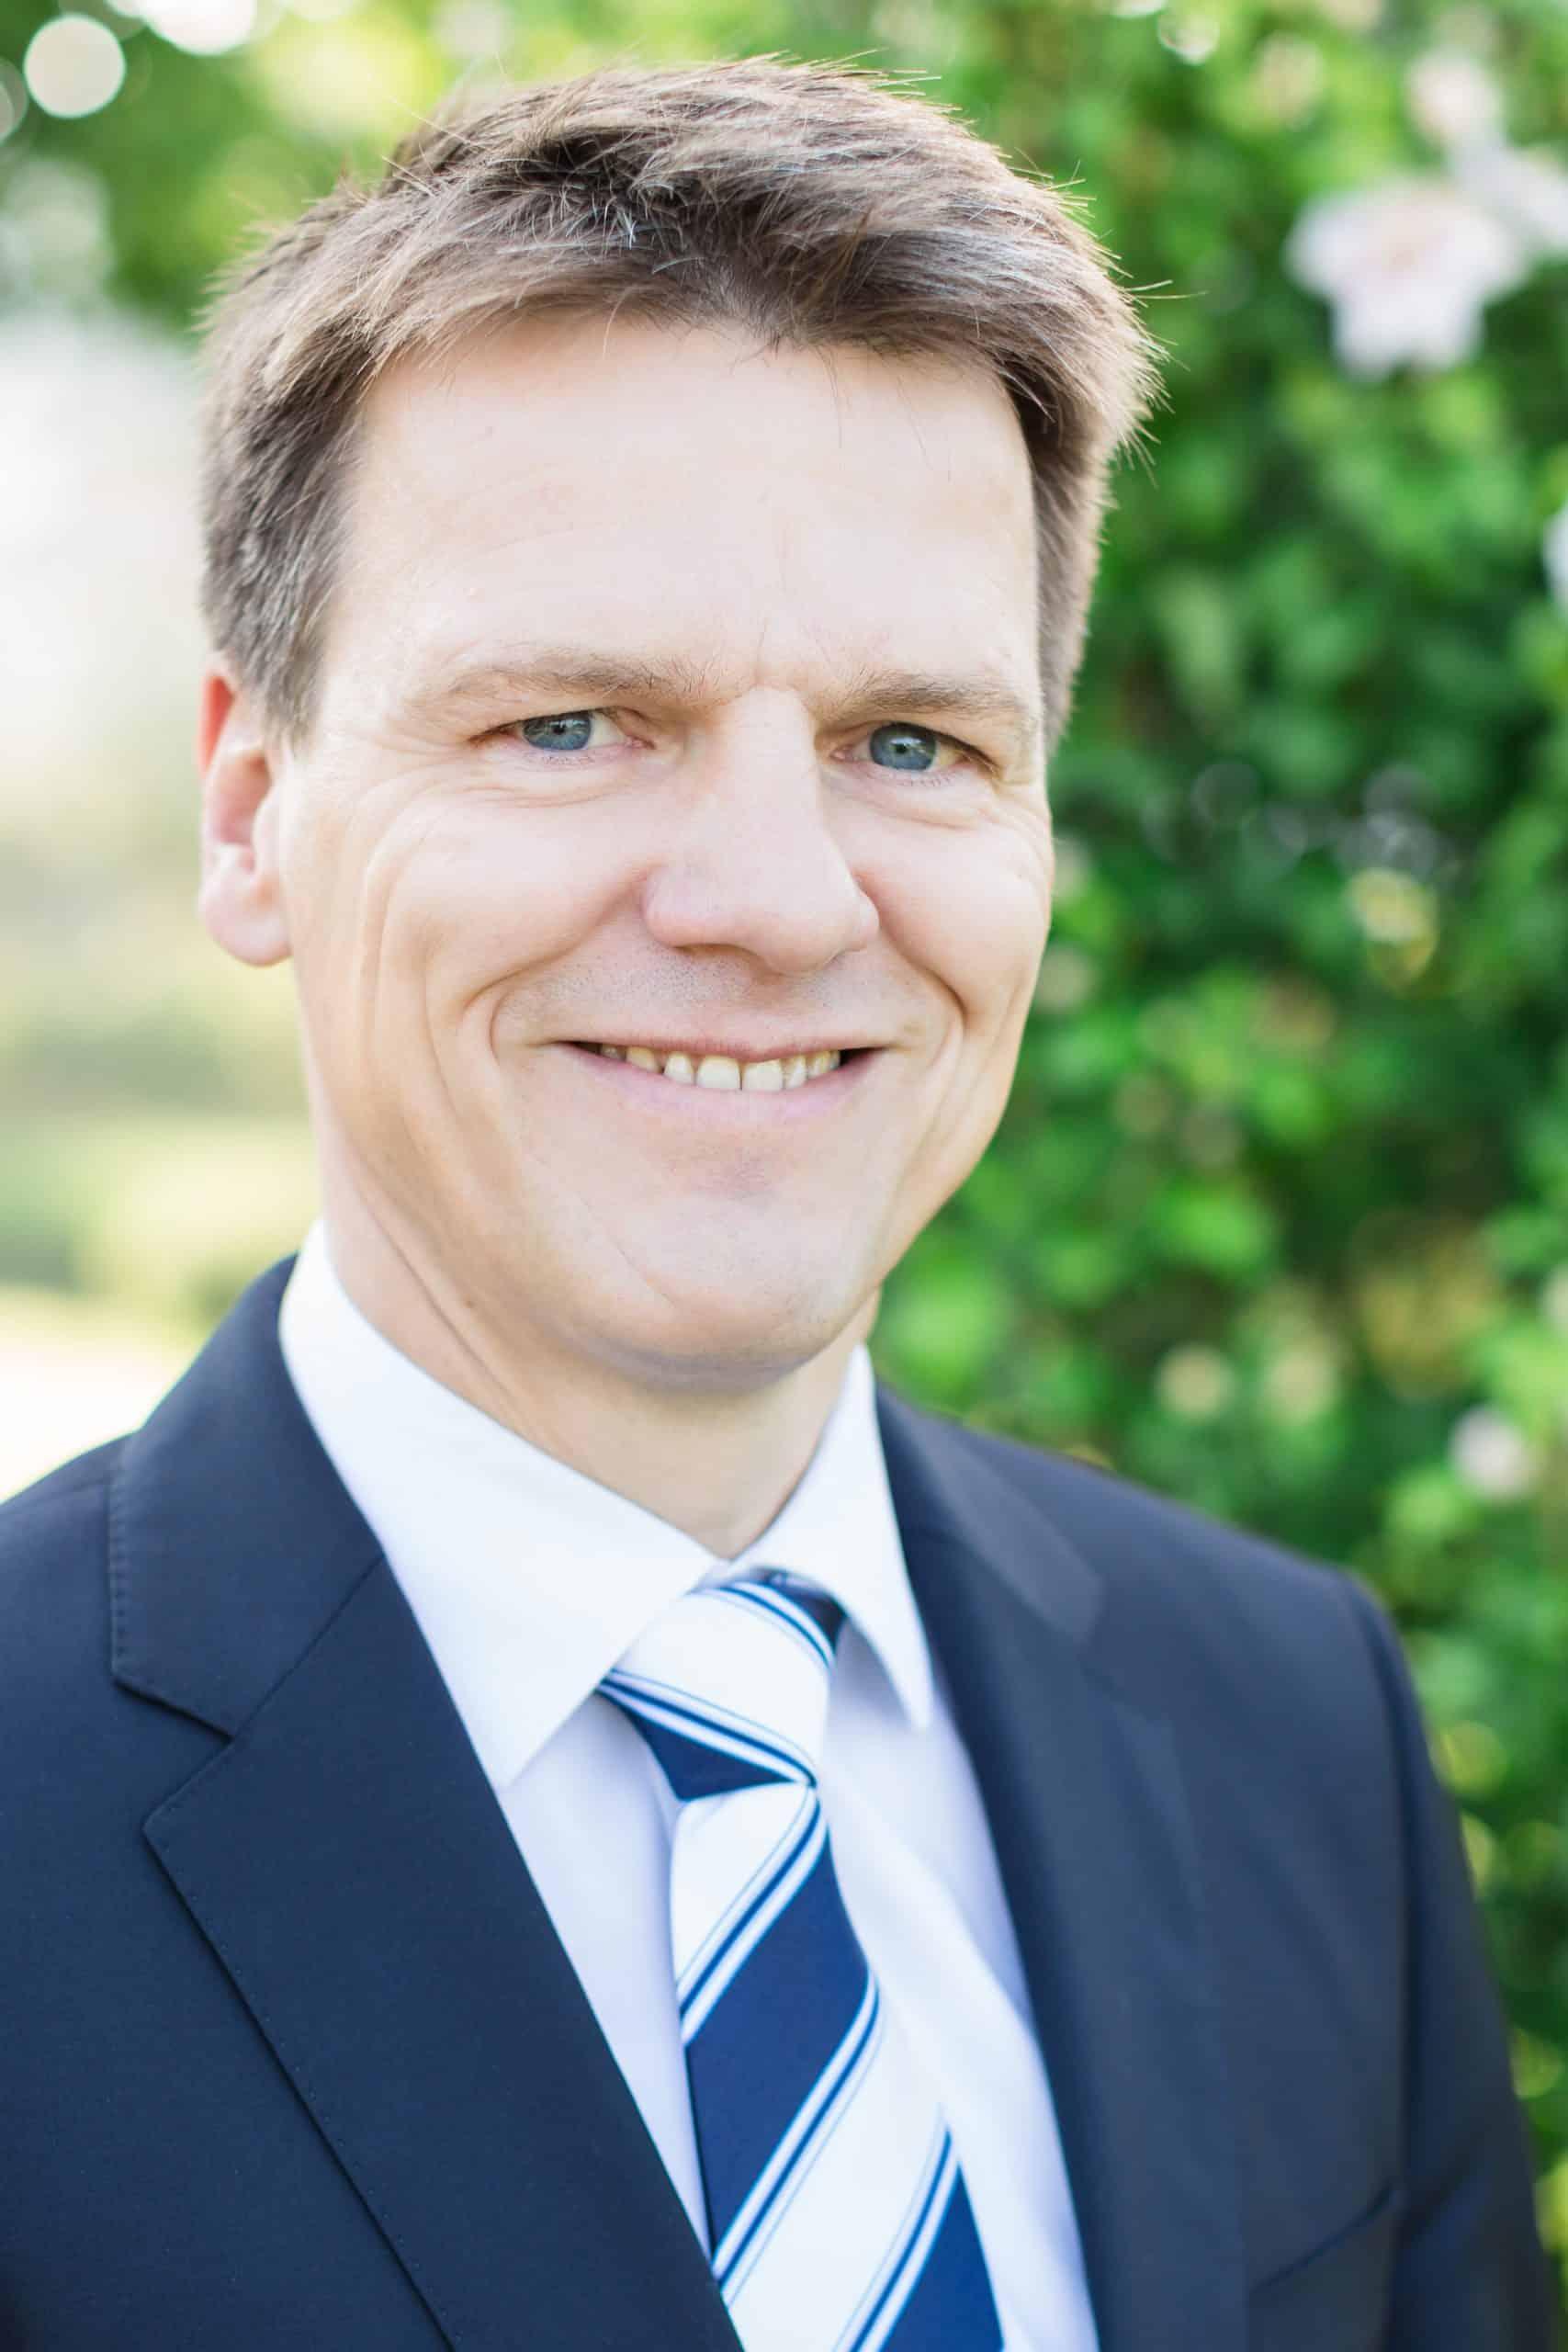 Dirk Haarmann